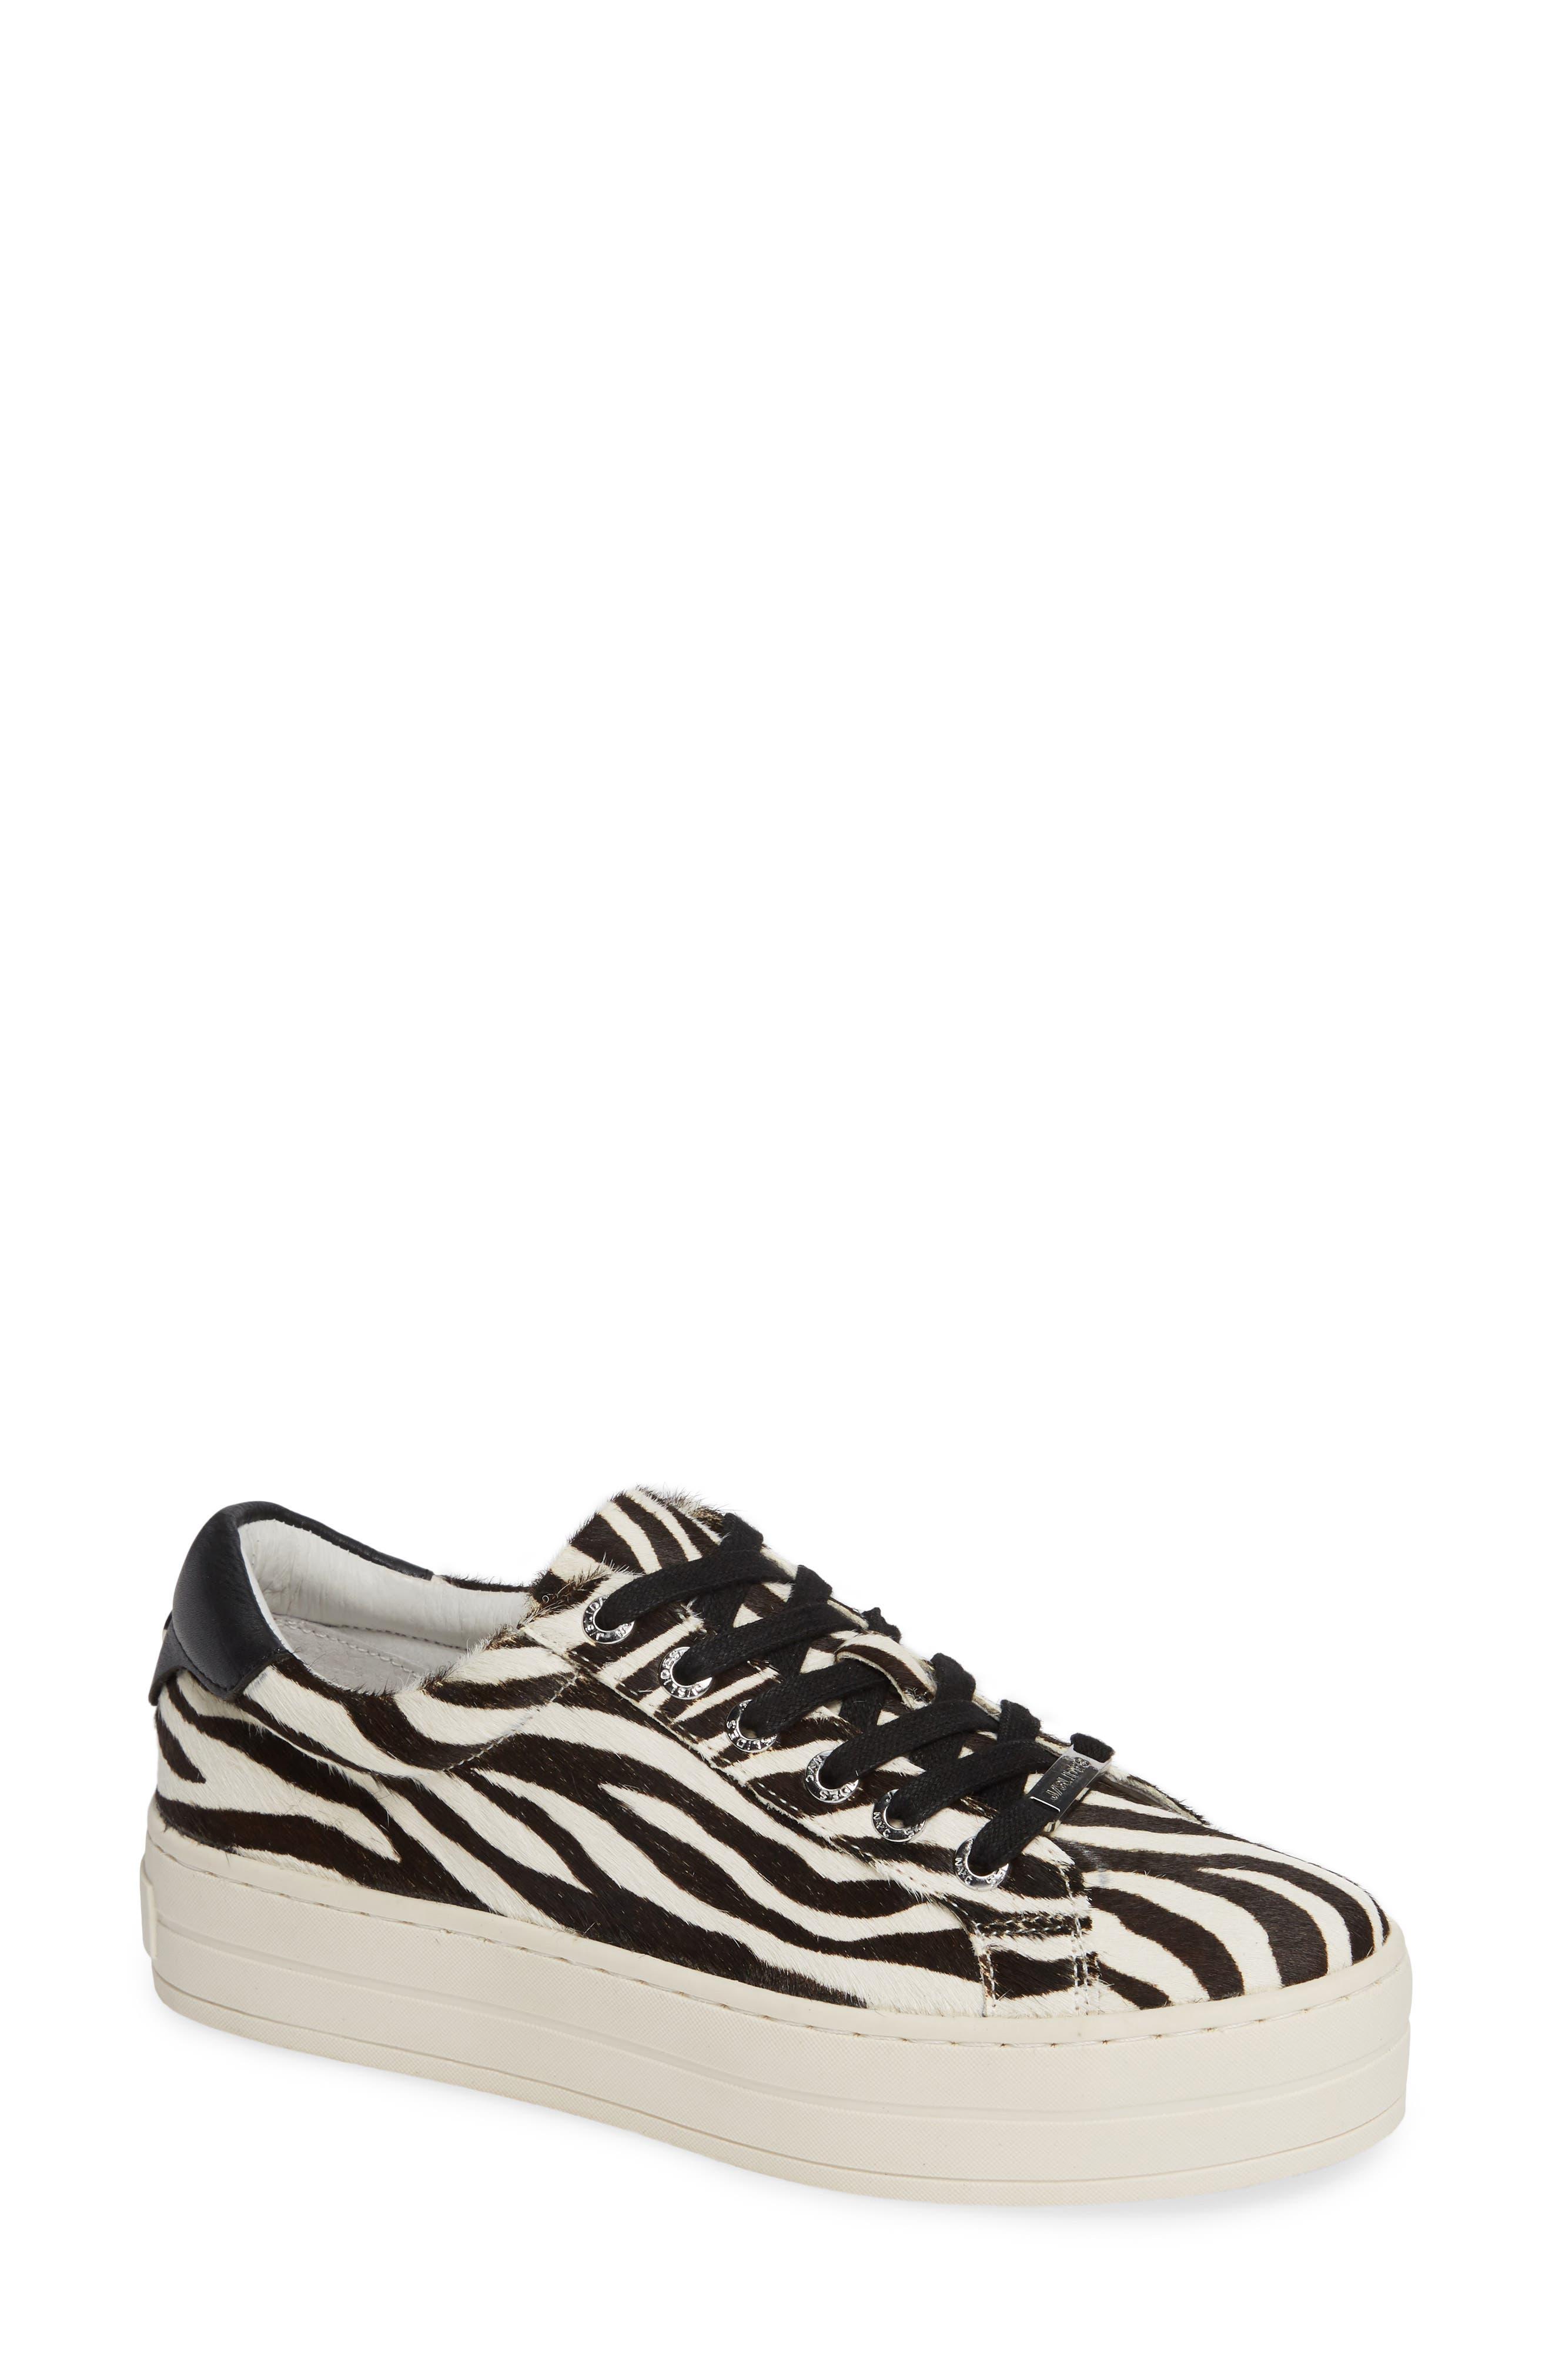 JSLIDES Hippie Genuine Calf Hair Platform Sneaker, Main, color, ZEBRA CALF HAIR